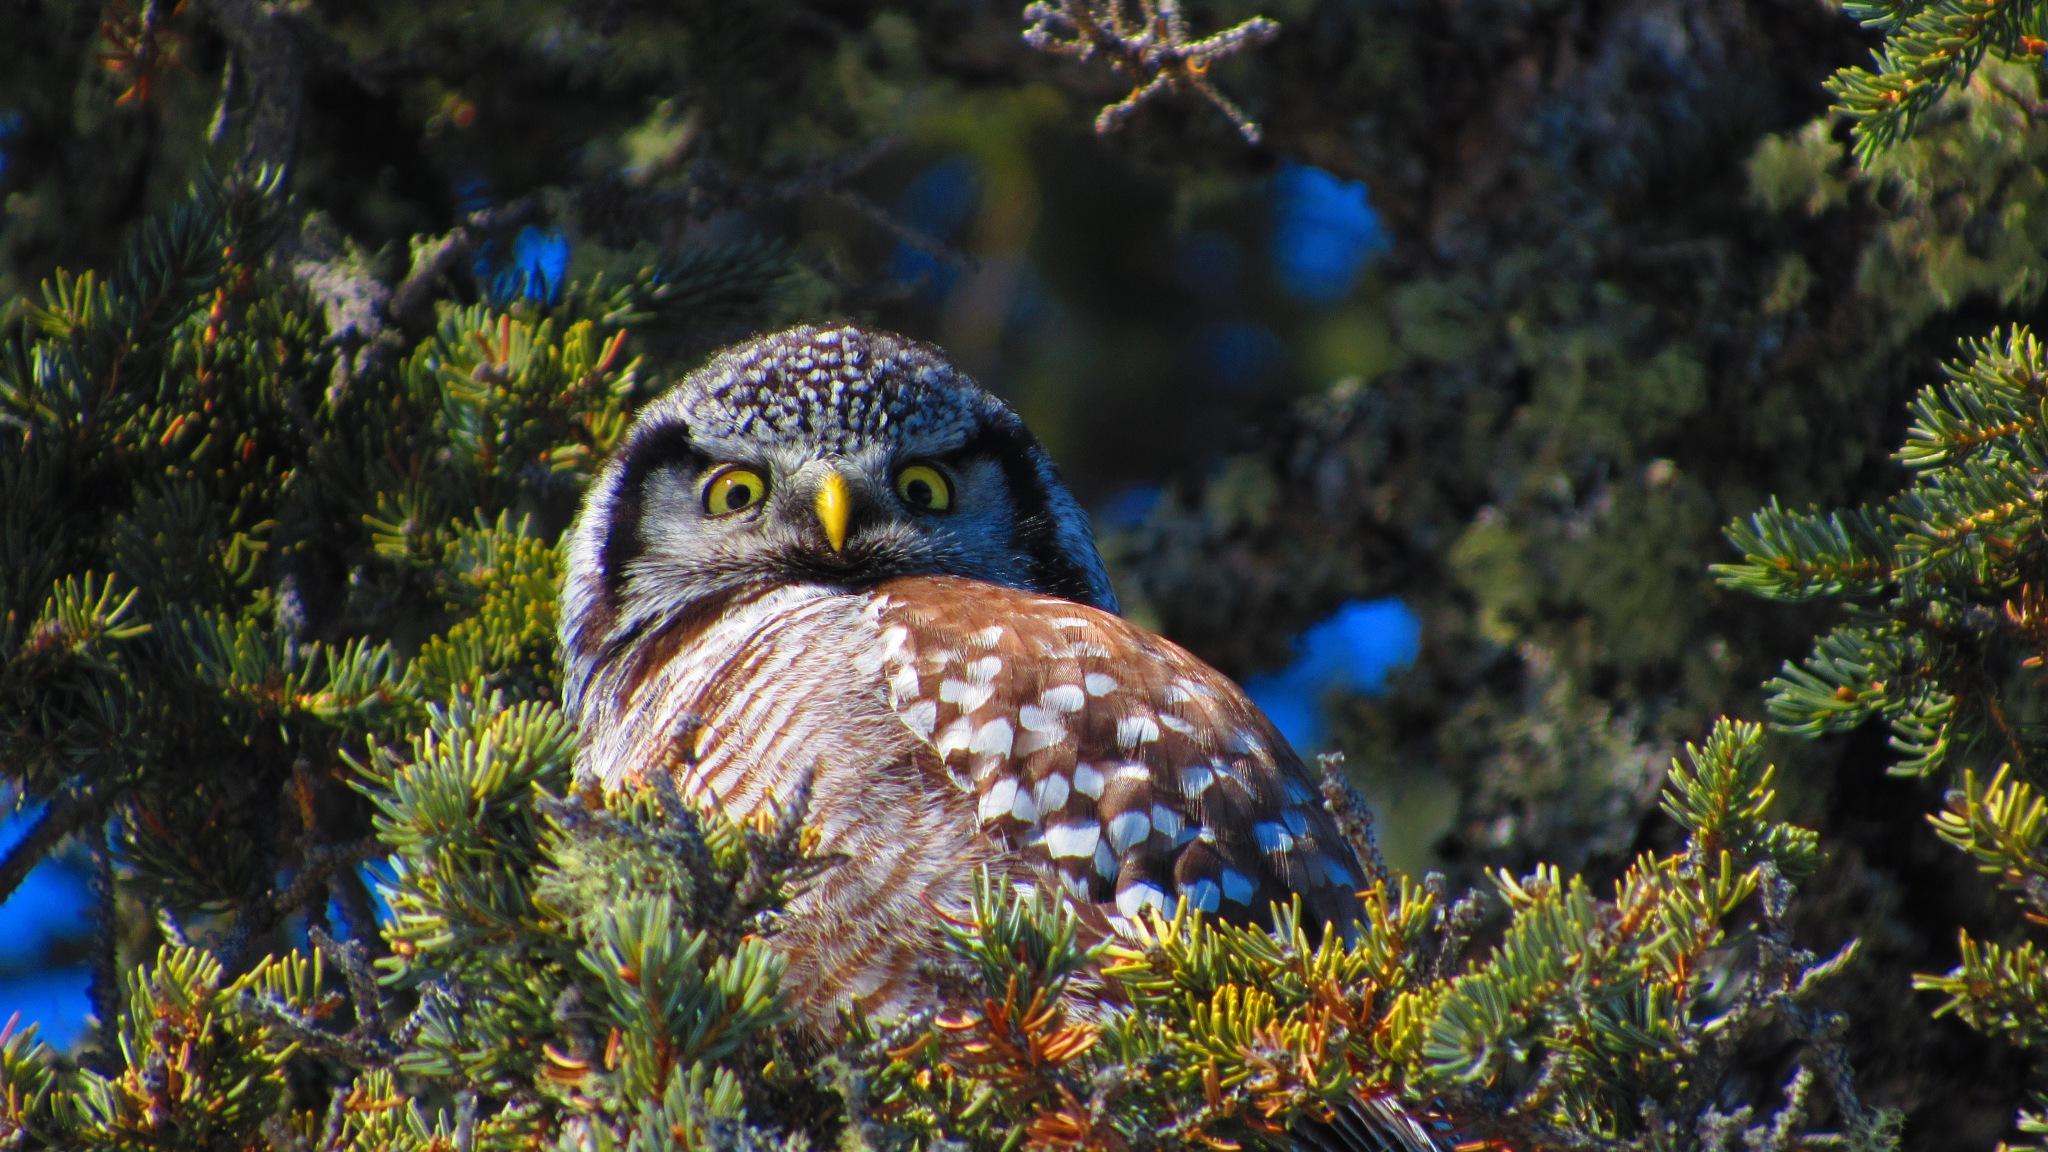 Northern Hawk Owl by katiekat63